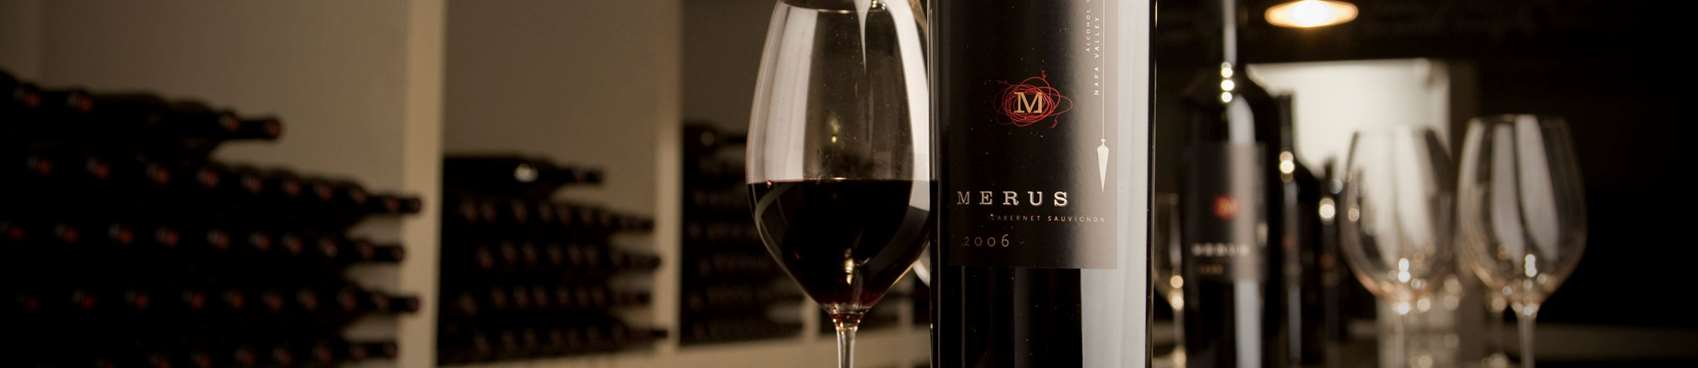 A image of Merus